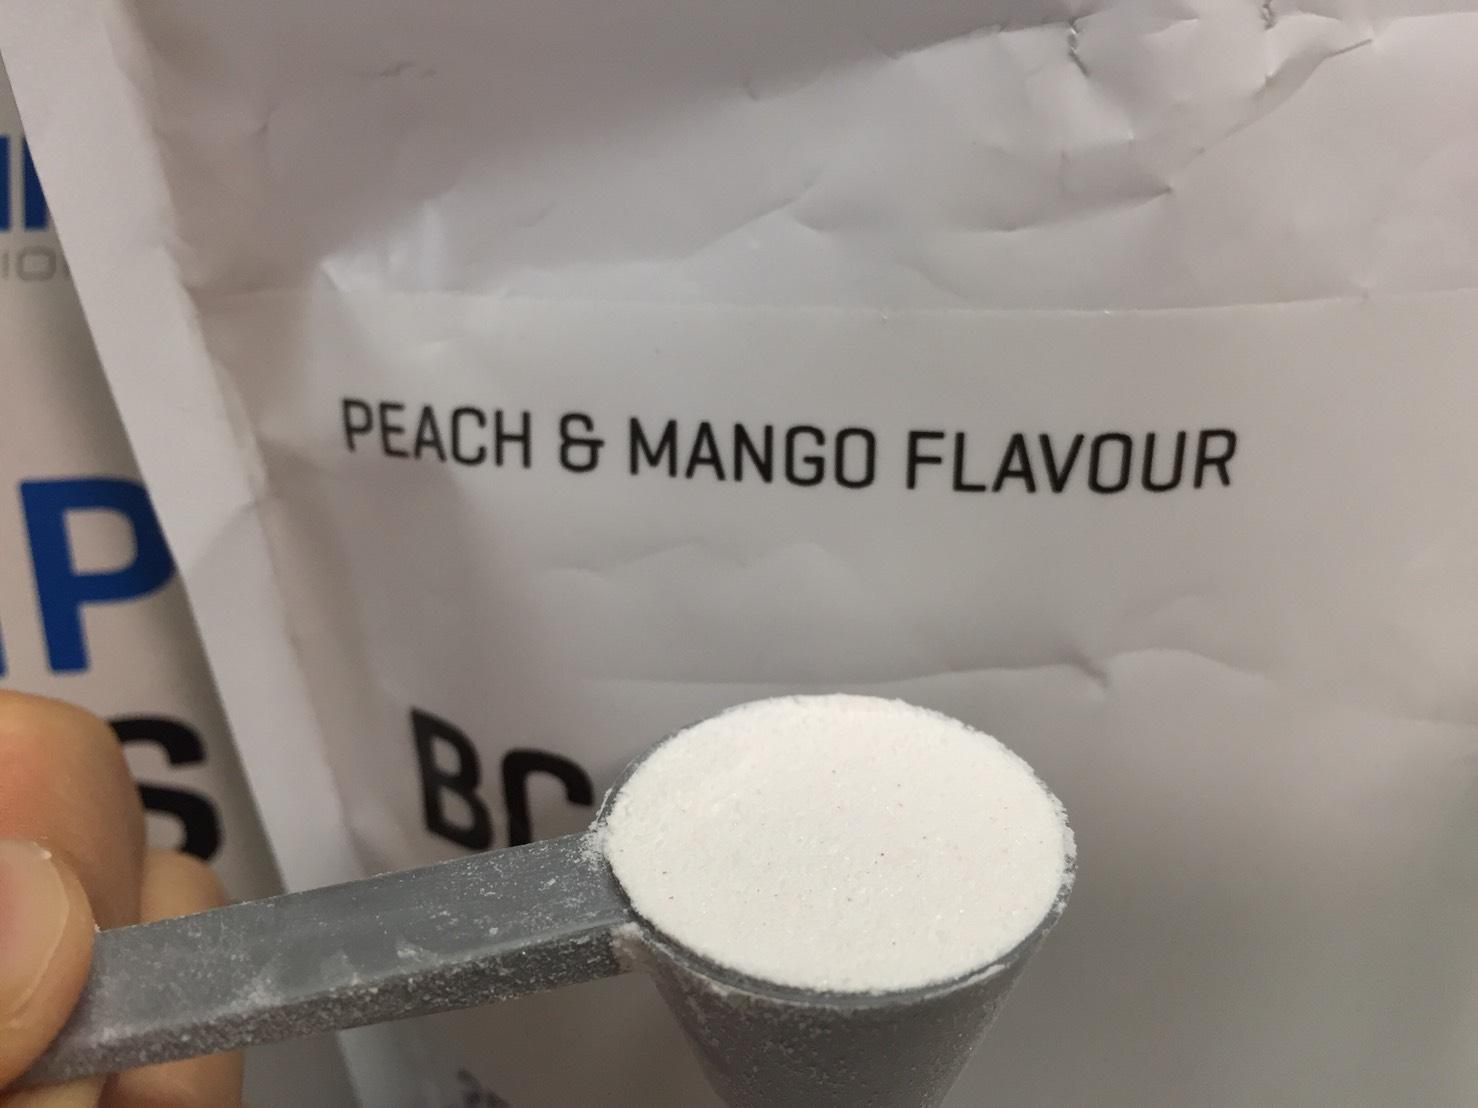 BCAA「ピーチ&マンゴー味(PEACH & MANGO FLAVOUR)」のスプーン摺り切り一杯の様子